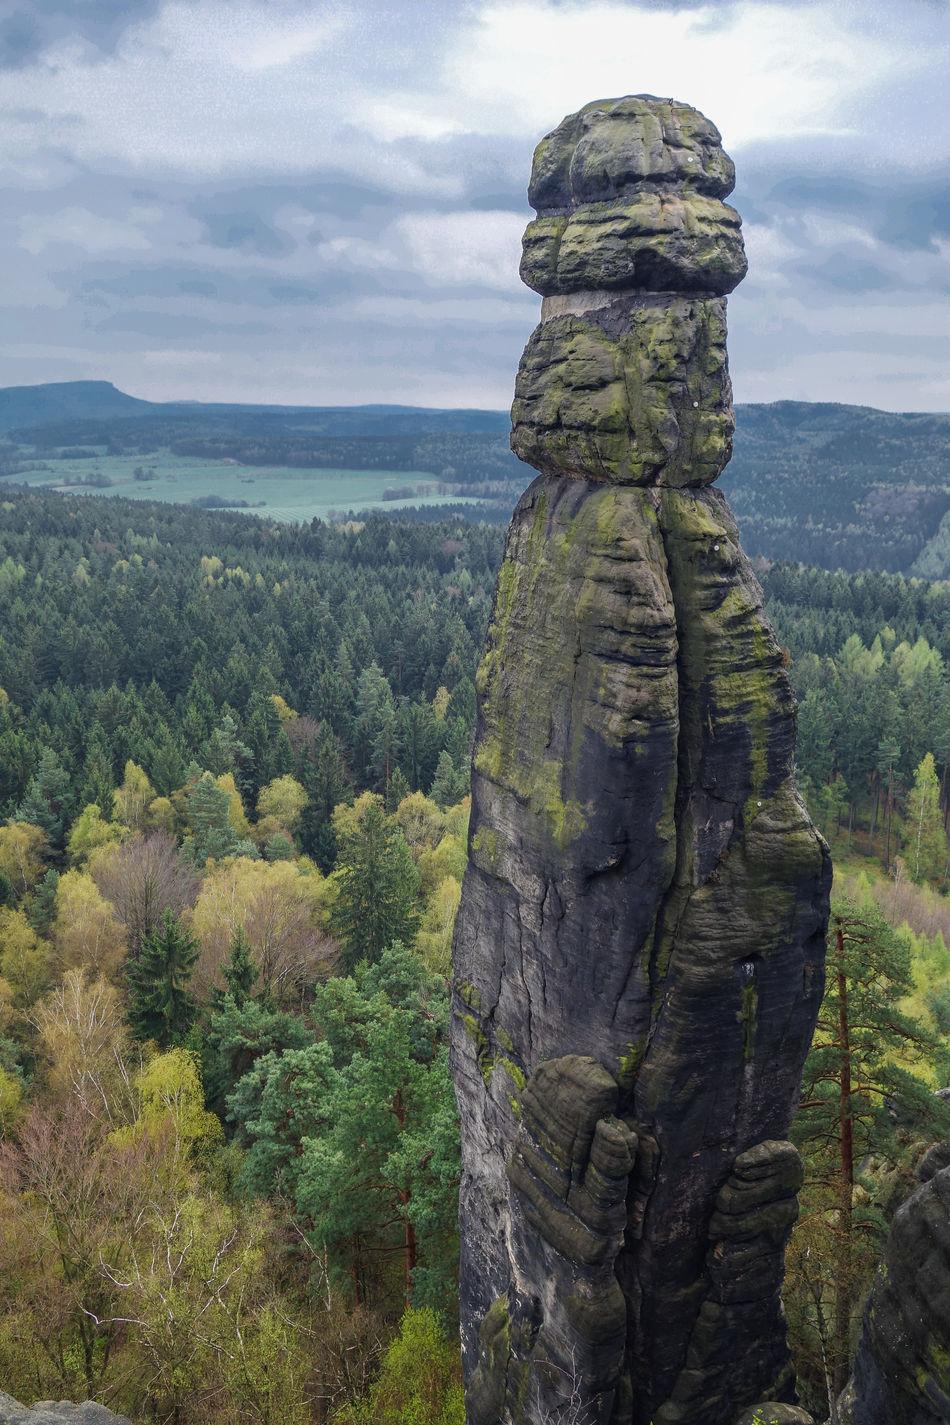 Barbarine Beauty In Nature Cloud - Sky Day Gernany Mountain National Park Nature No People Outdoors Rock - Object Saxon Switzerland Sculpture Sky Statue Sächsische Schweiz Tree